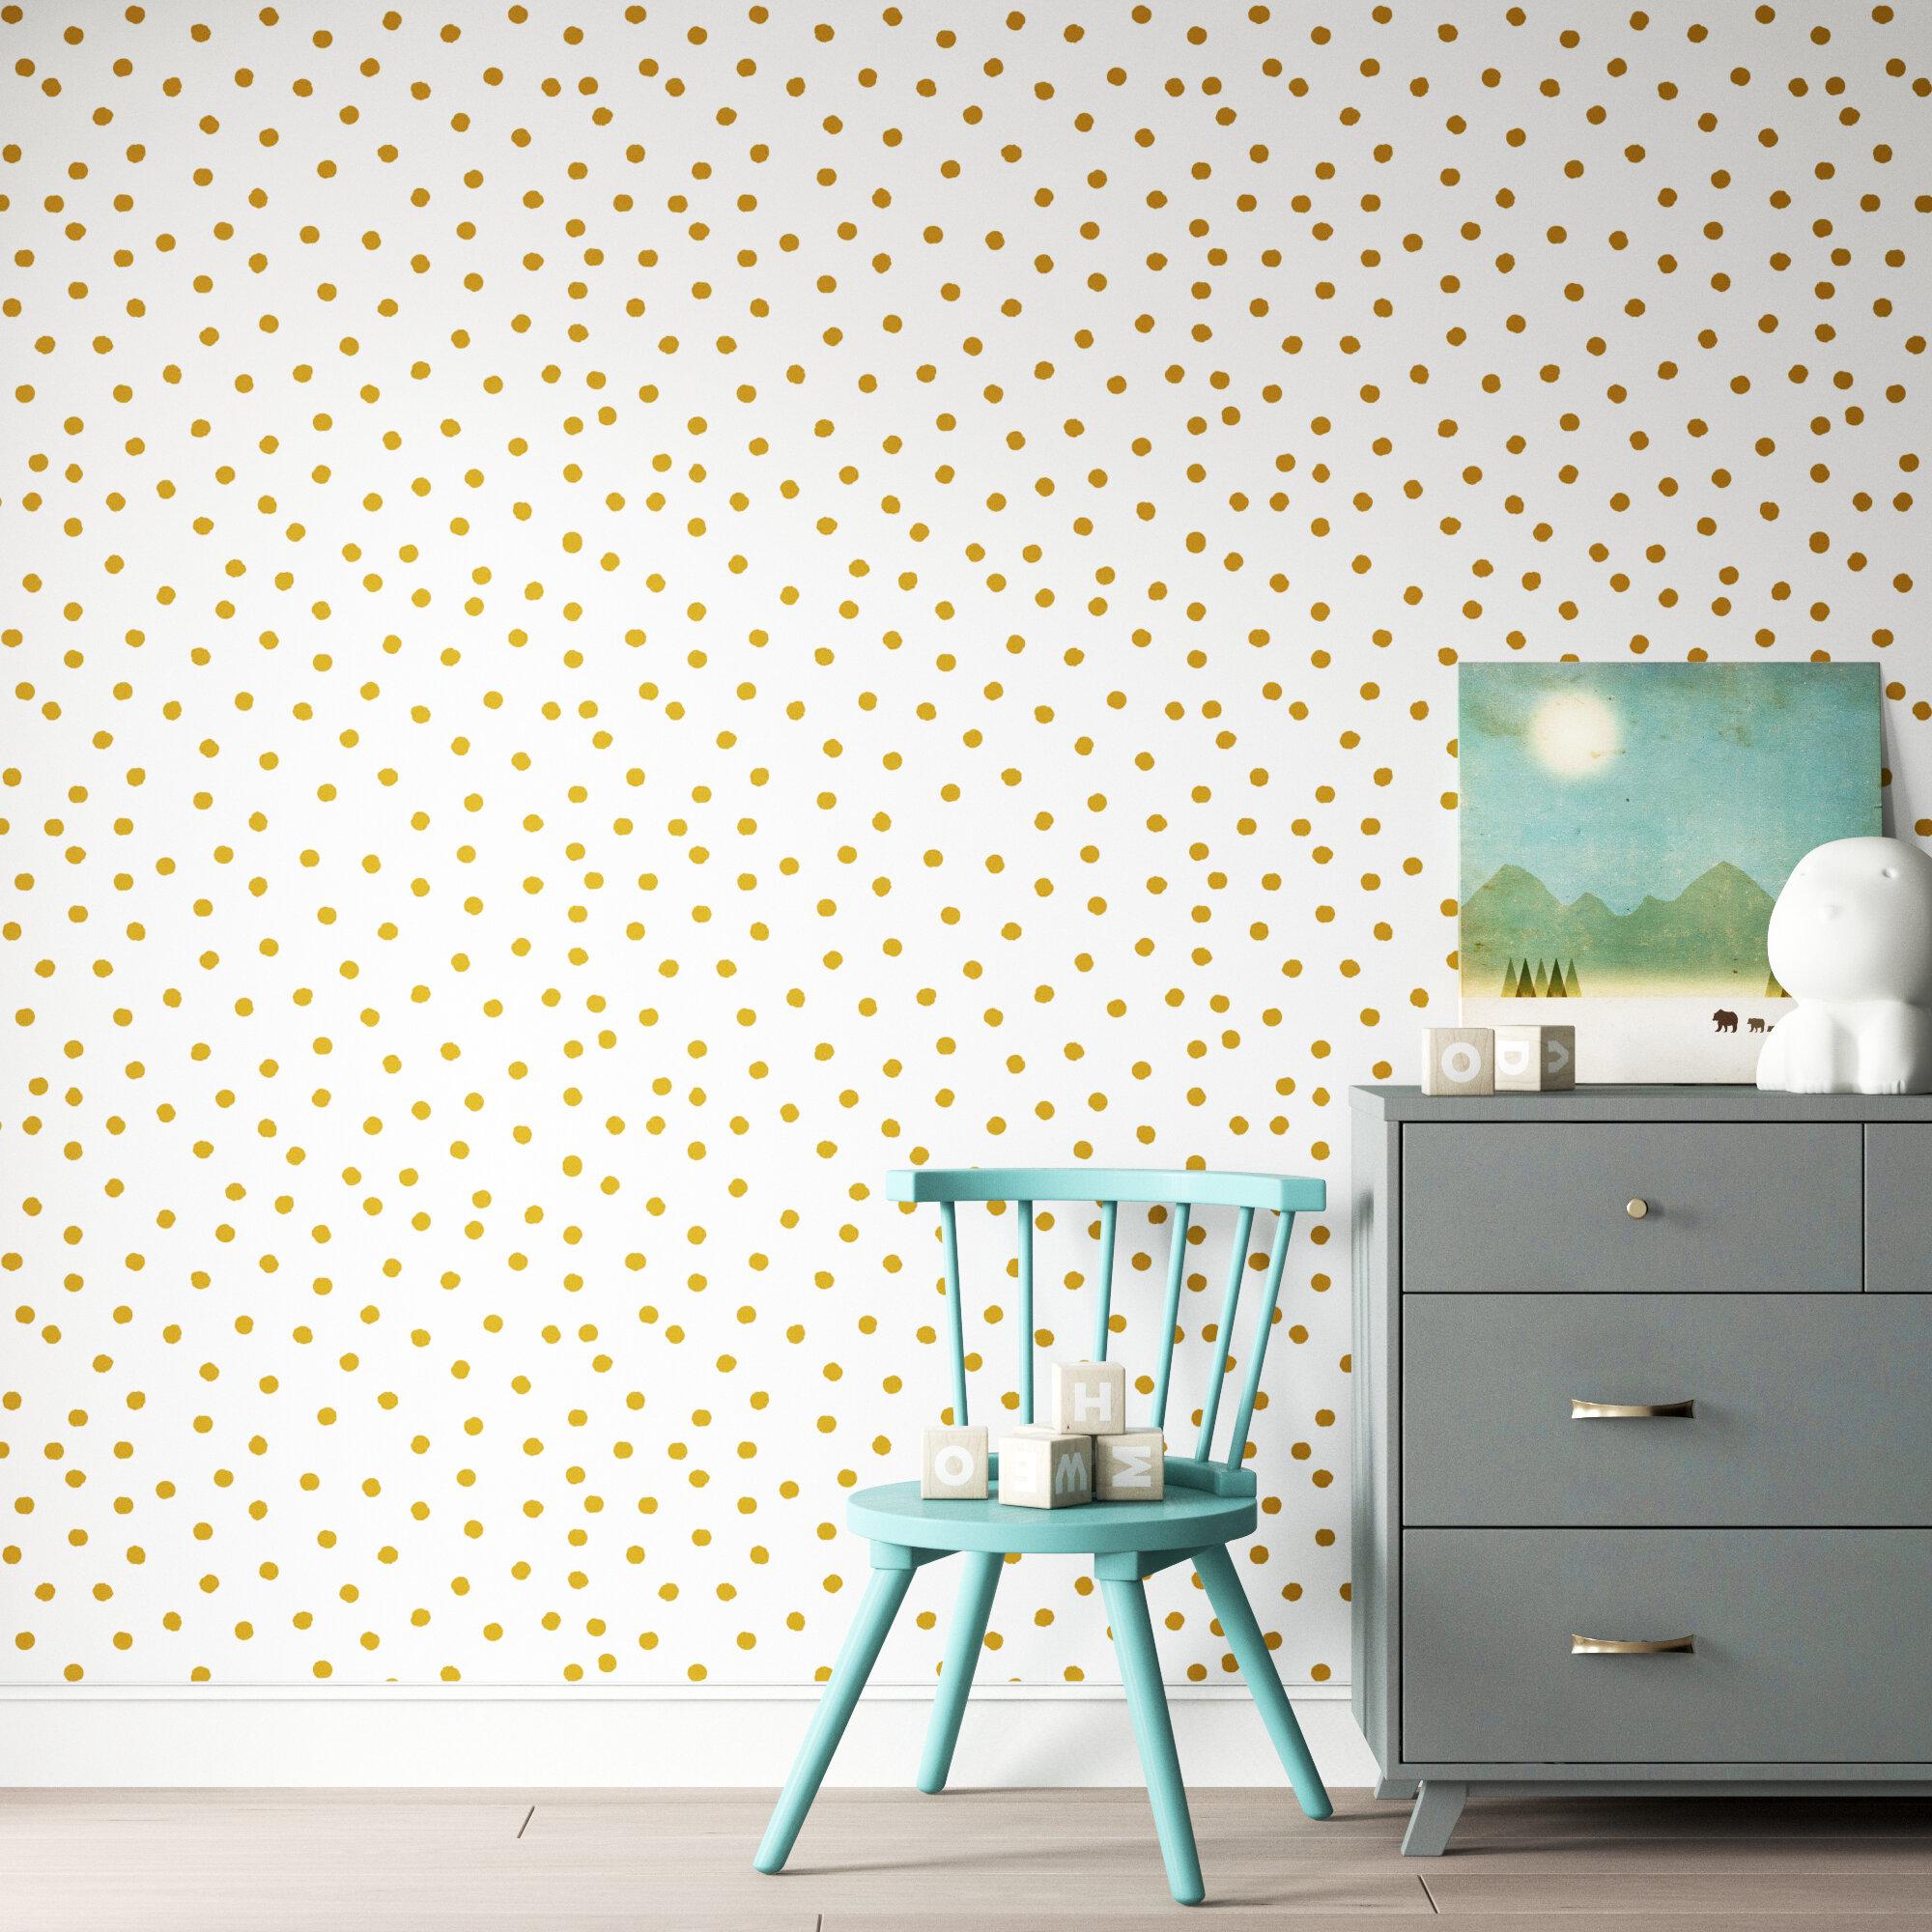 Mack Milo Akerman 16 5 L X 20 5 W Dot Geometric Peel And Stick Wallpaper Roll Reviews Wayfair